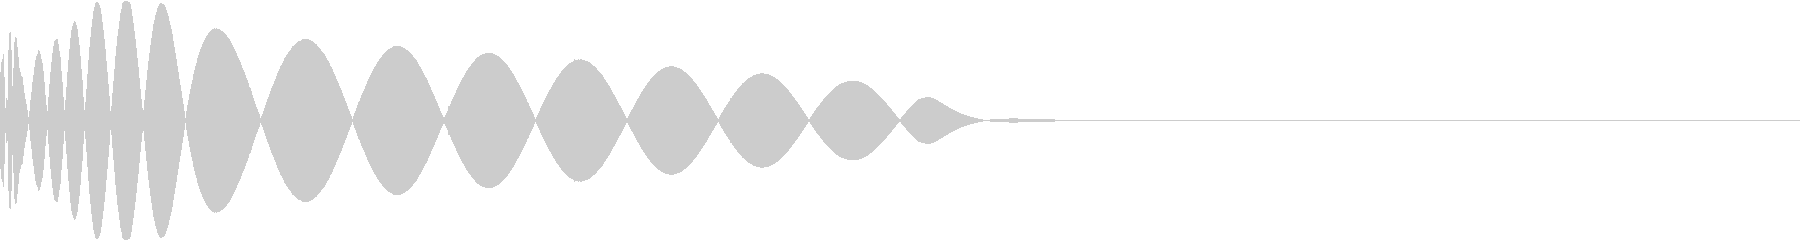 DTM Kick 40 オリジナル音源の未再生の波形